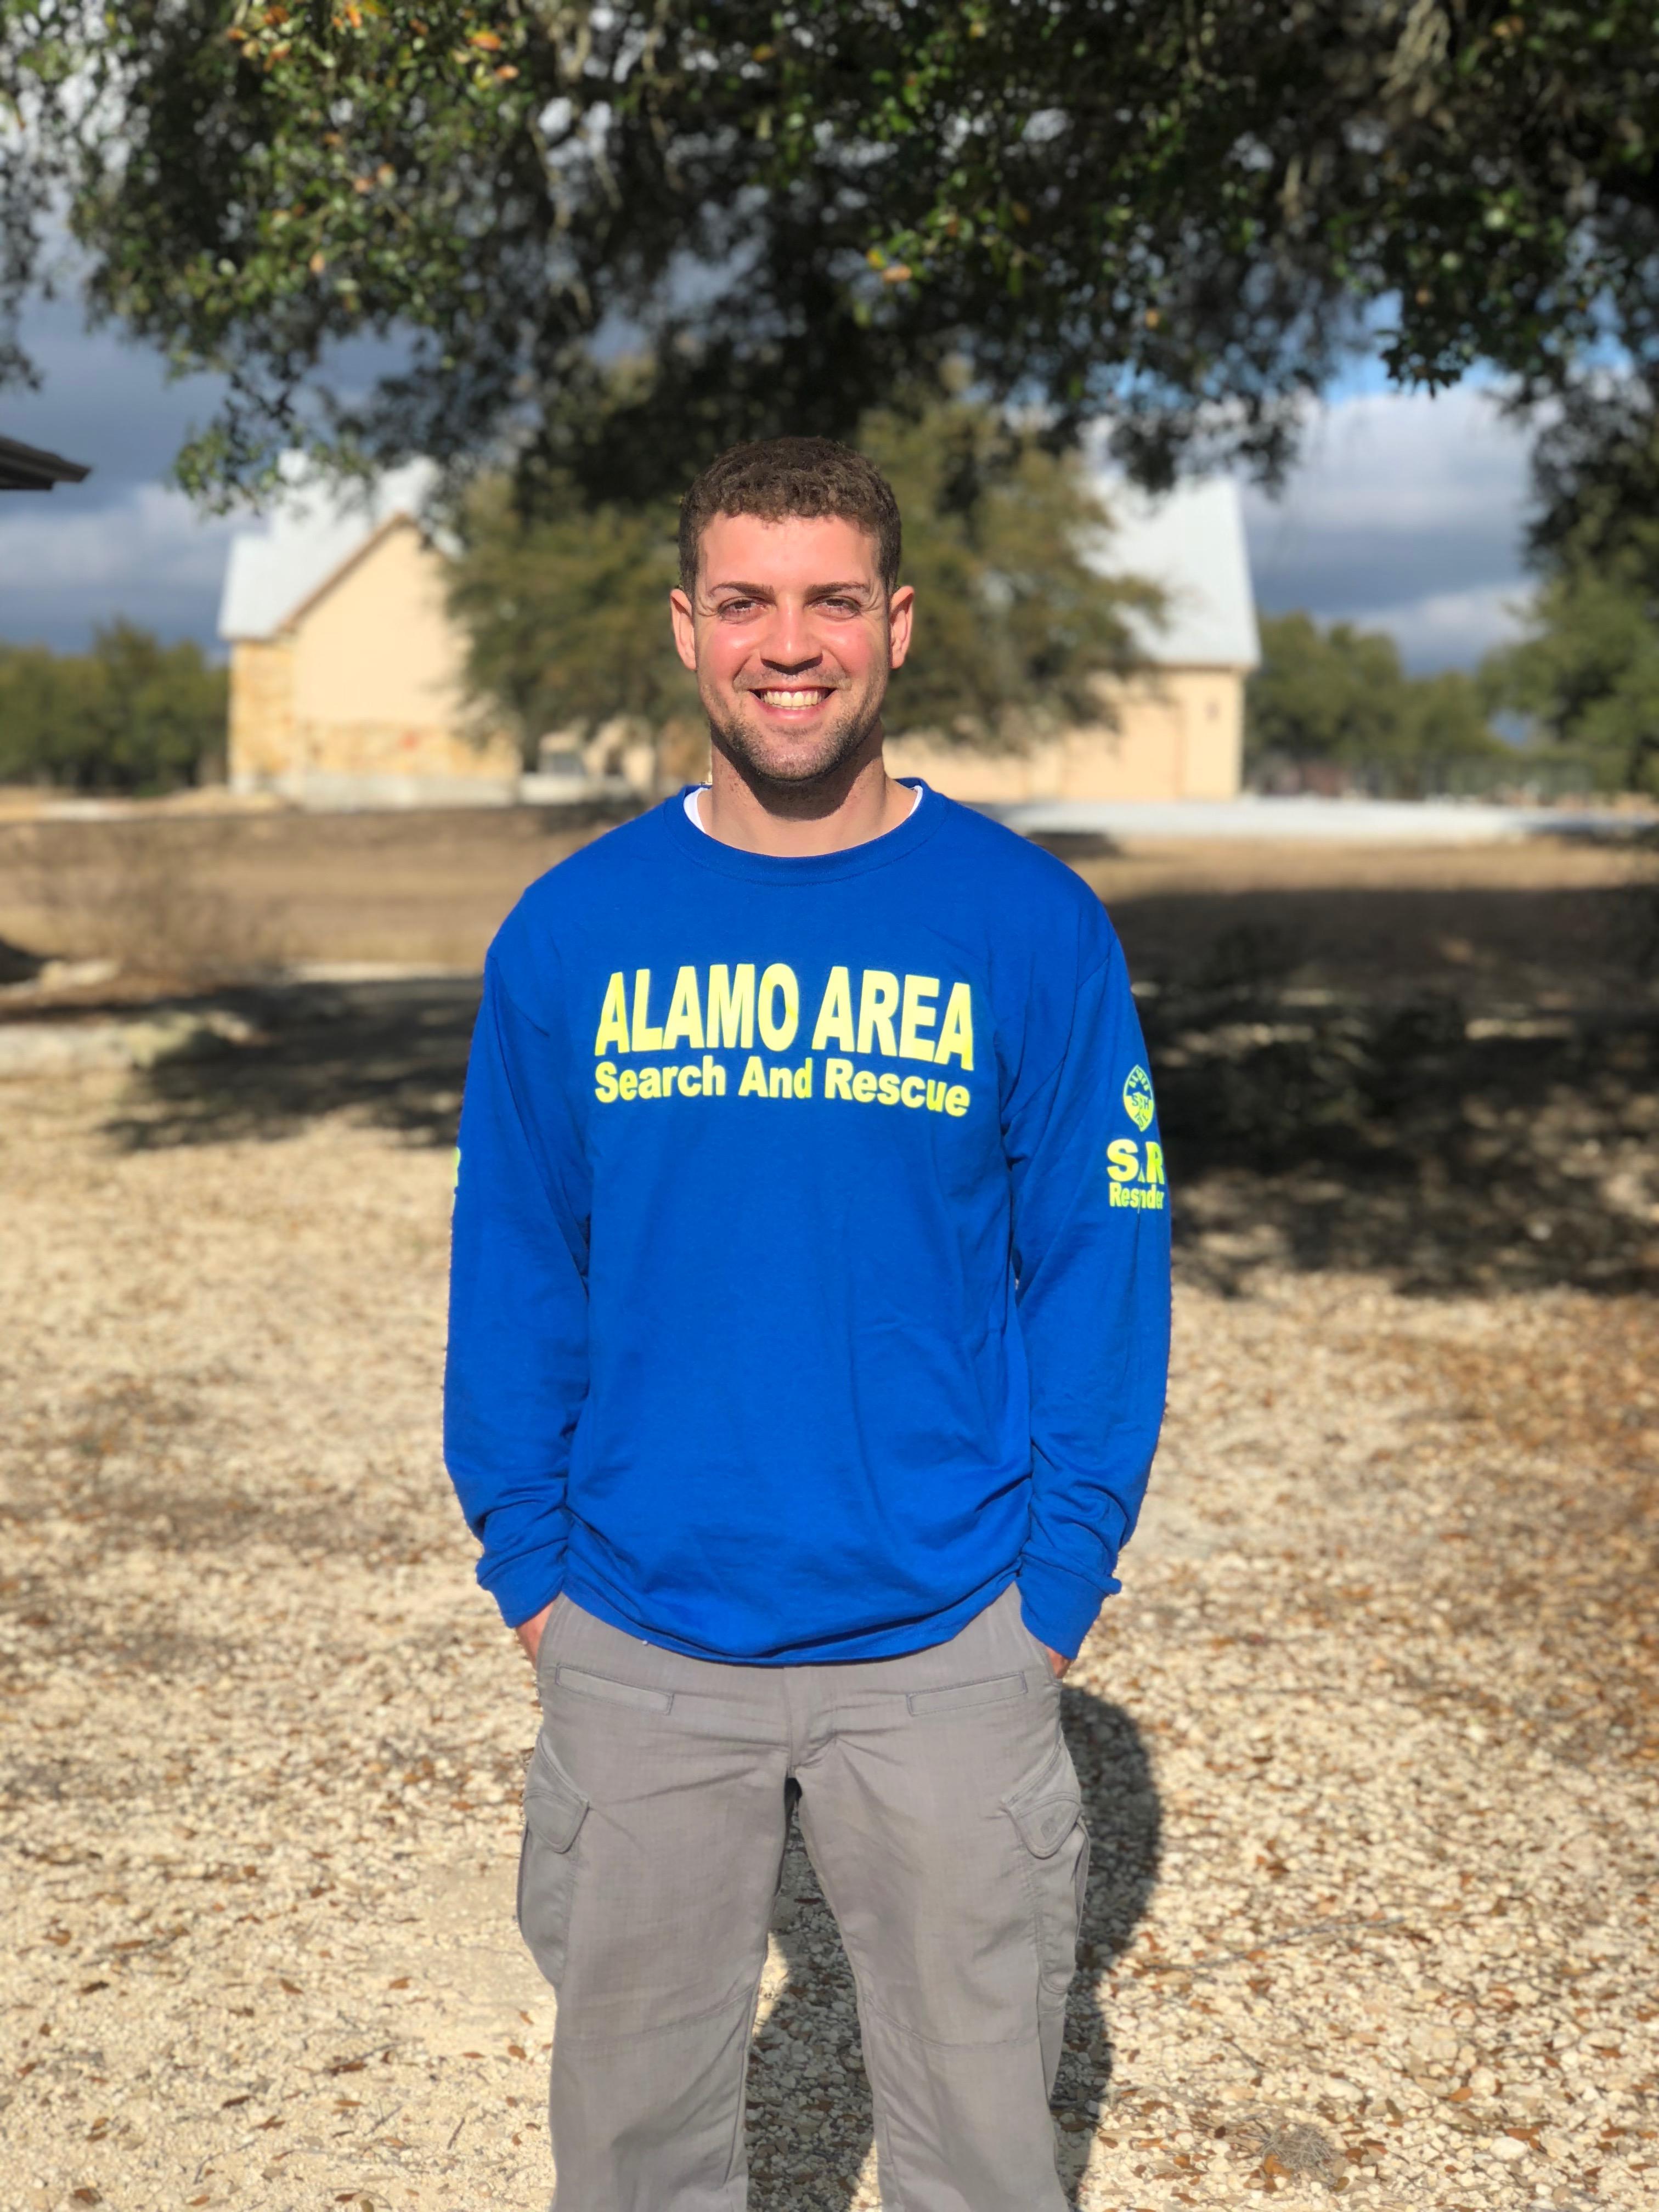 Team Members - Alamo Area Search and Rescue